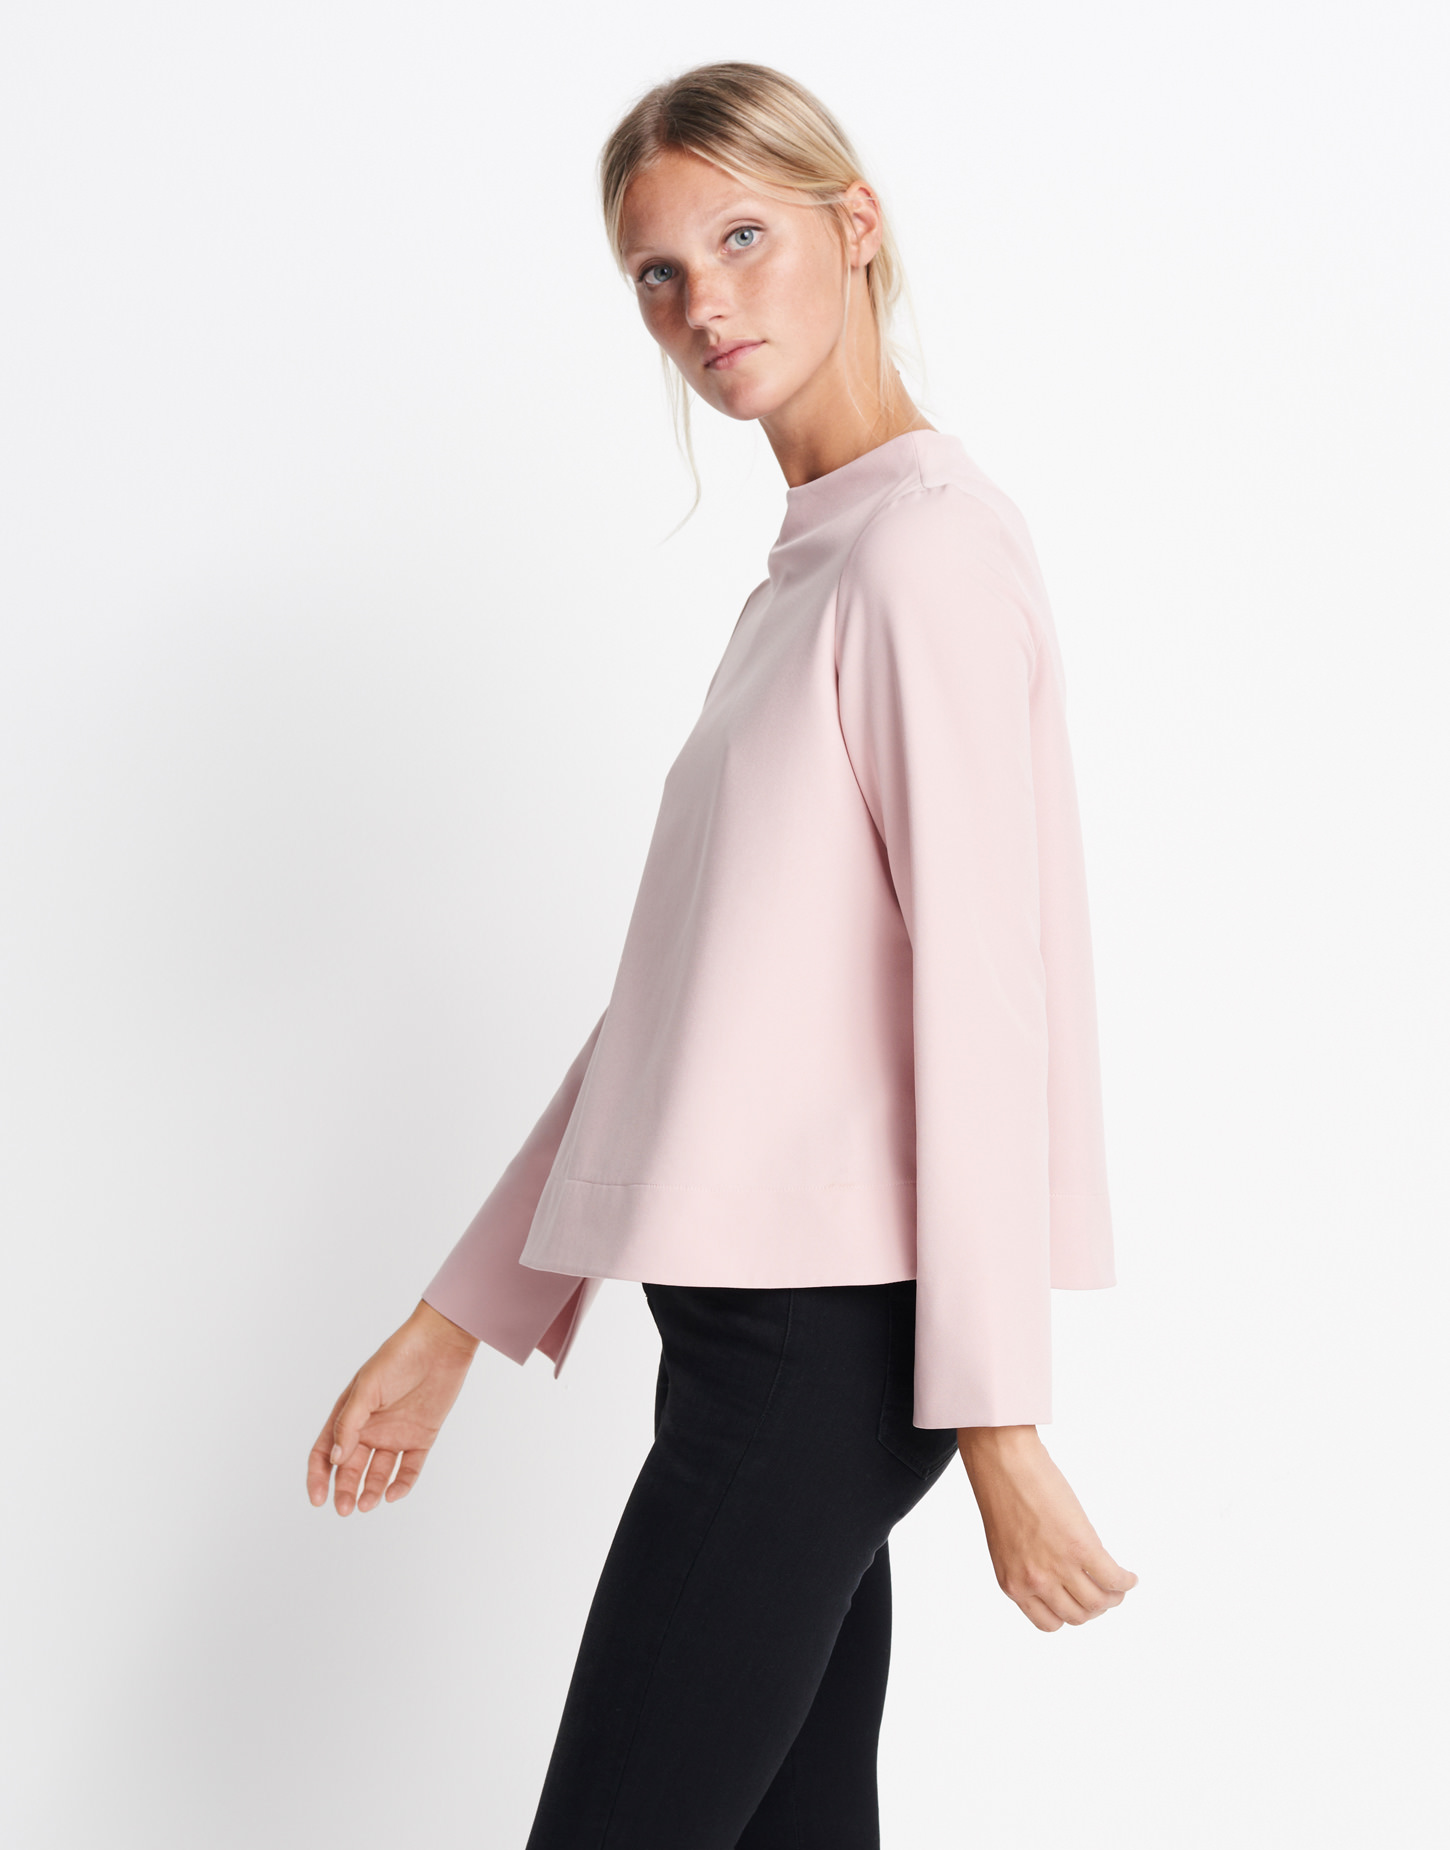 shirtbluse zinita ros online bestellen someday online shop. Black Bedroom Furniture Sets. Home Design Ideas